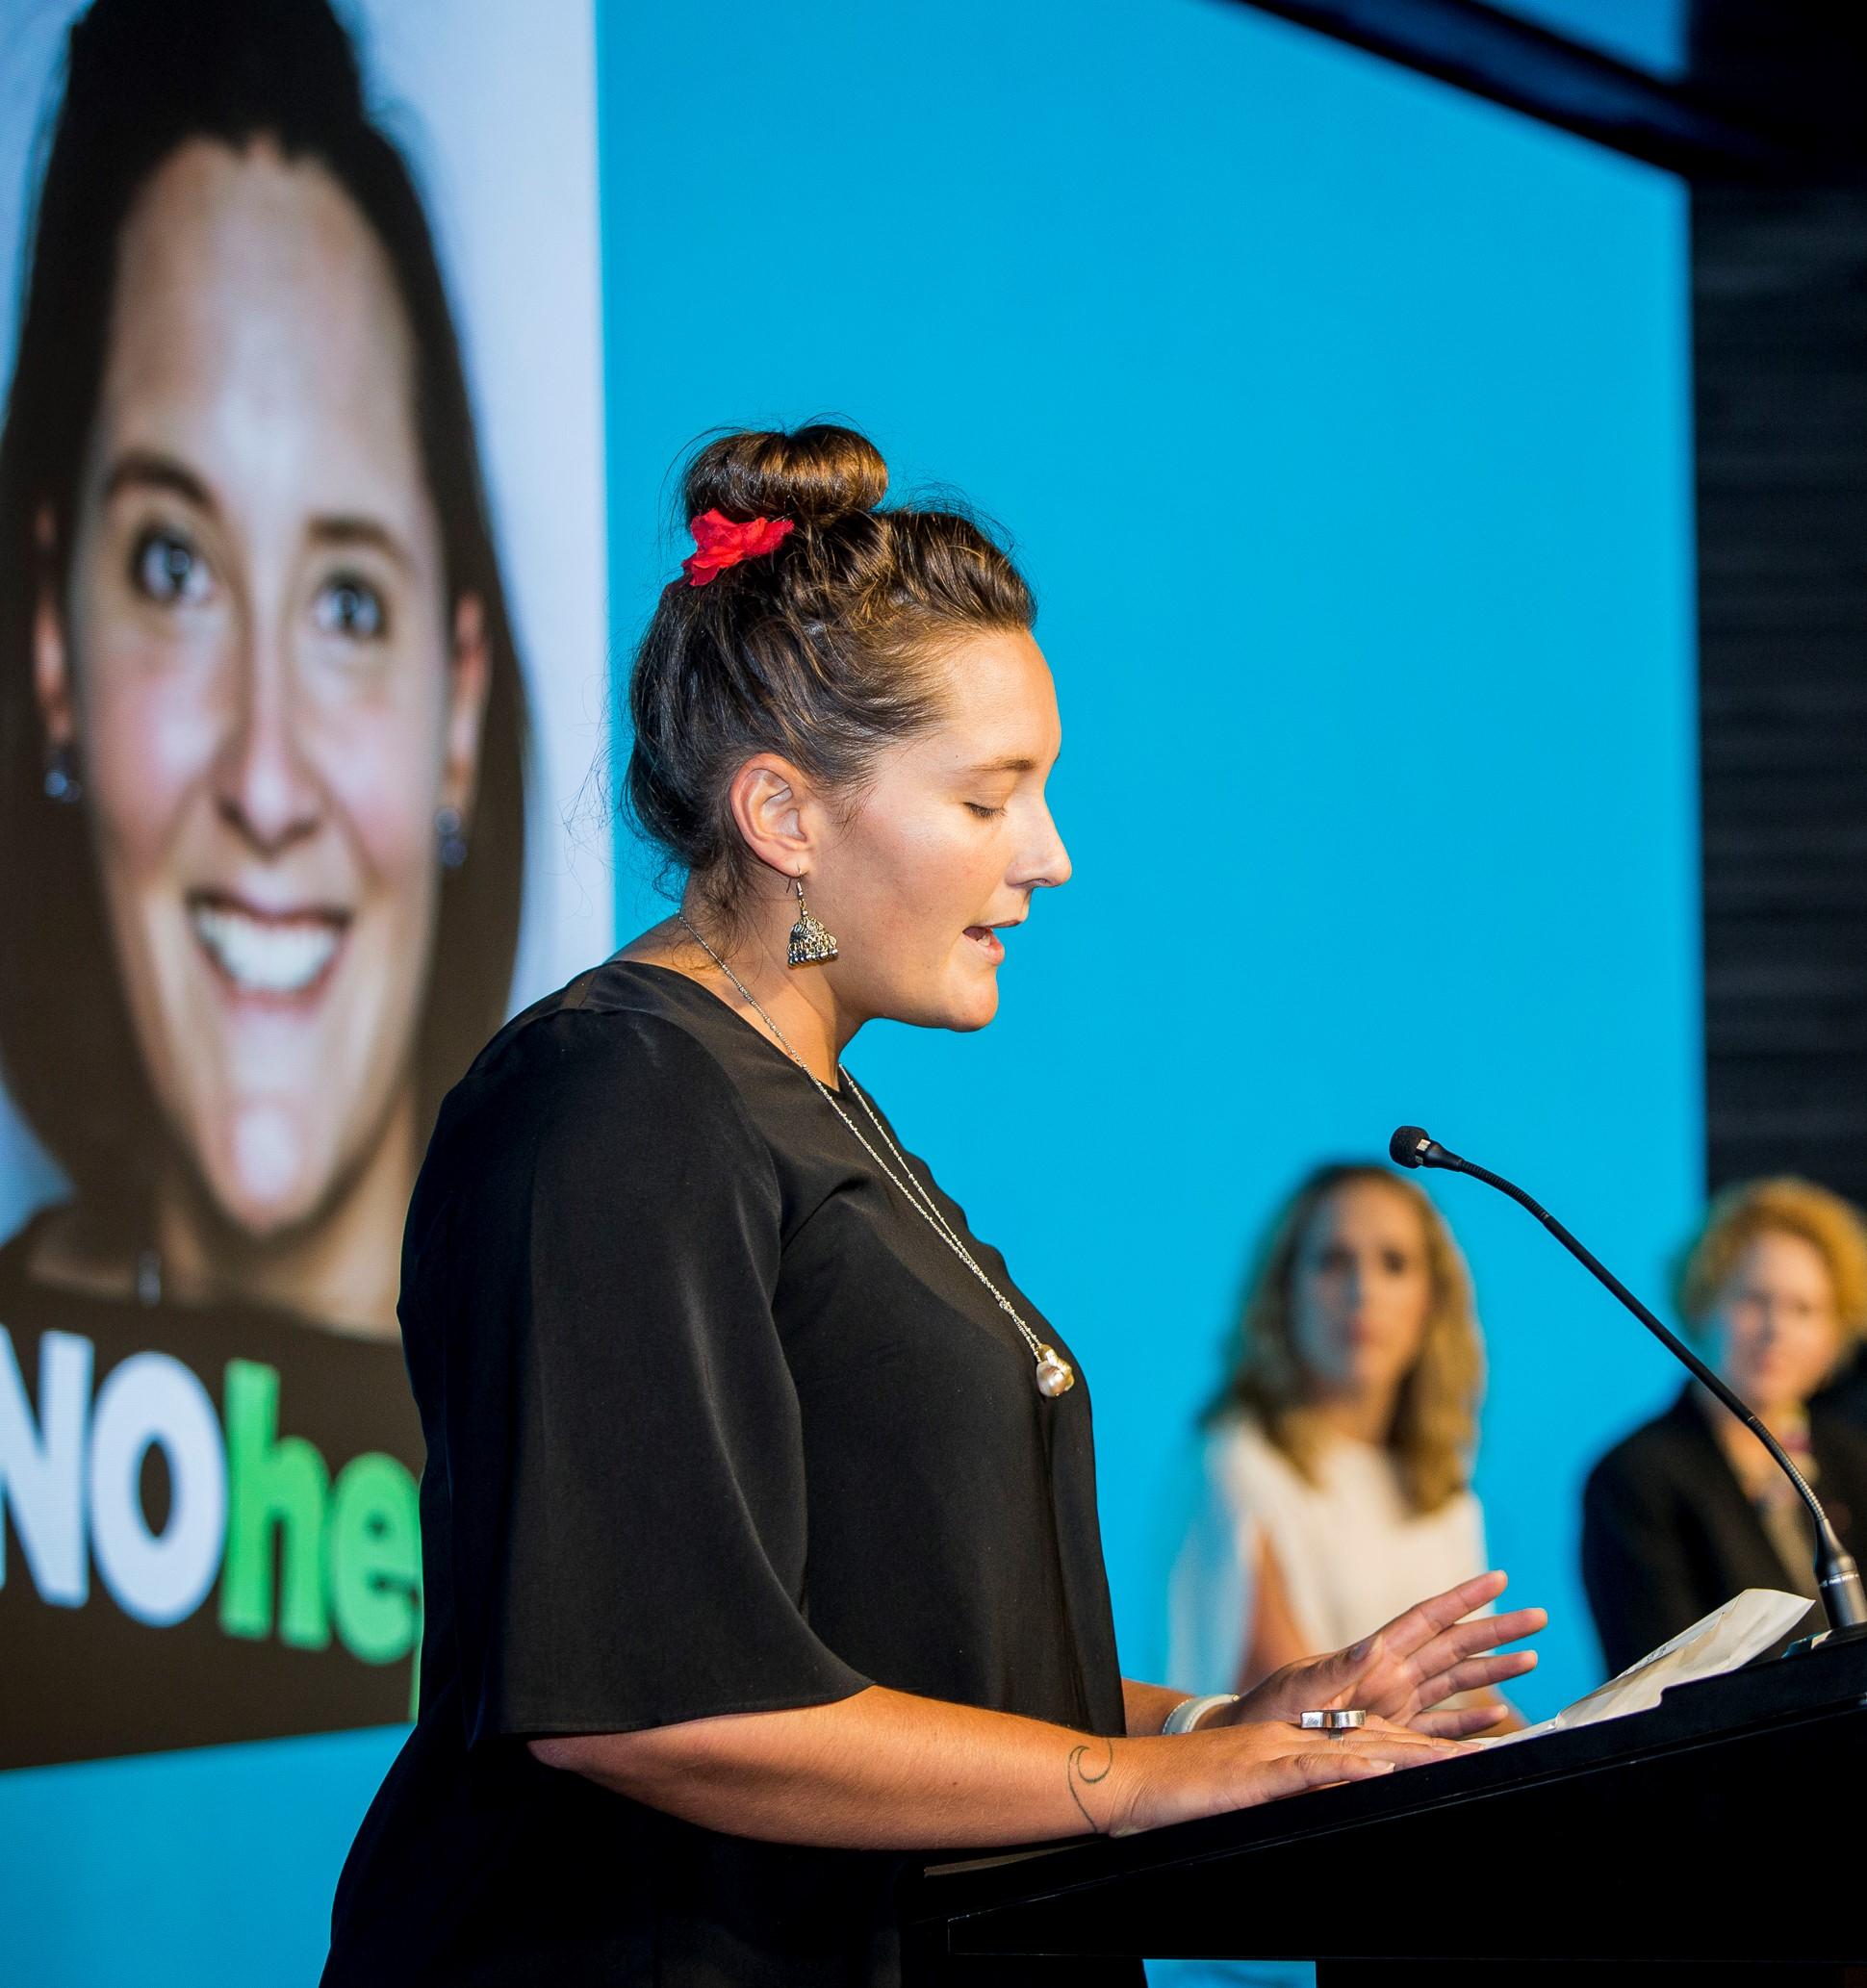 NOhep Supporter Spotlight: Sofia Bartlett